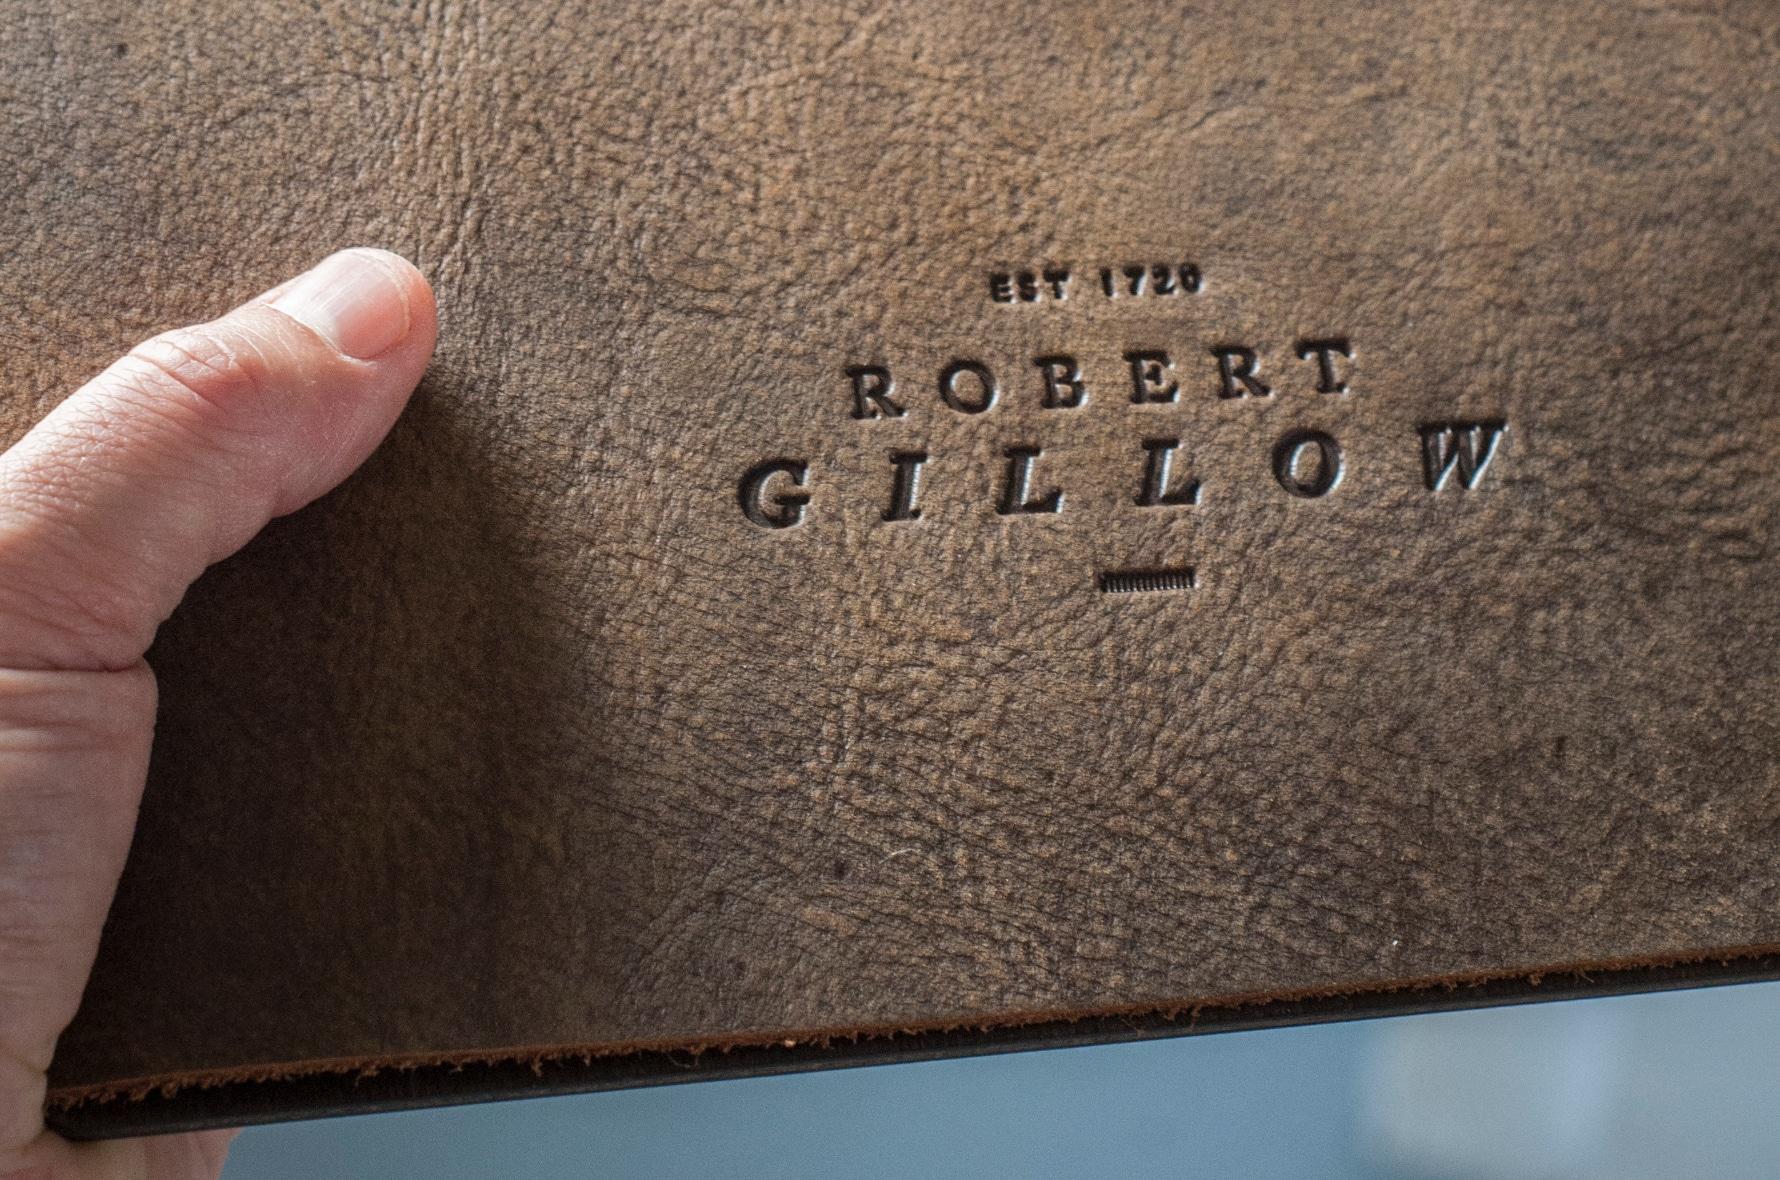 Robert Gillow leather menu cover